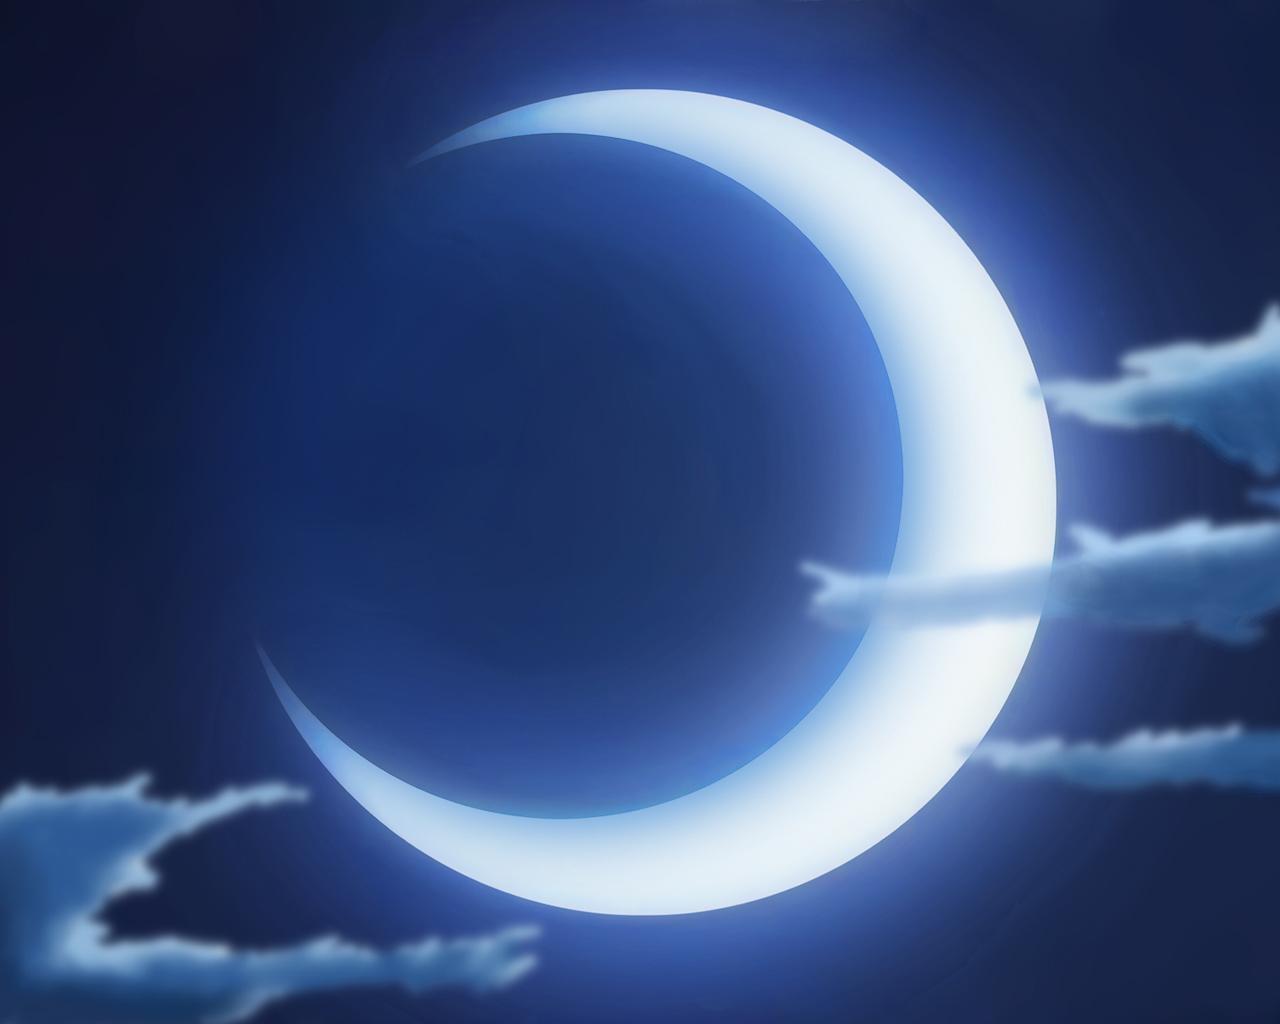 Crescent moon wallpaper 1280x1024 55112 for Cuarto menguante de la luna